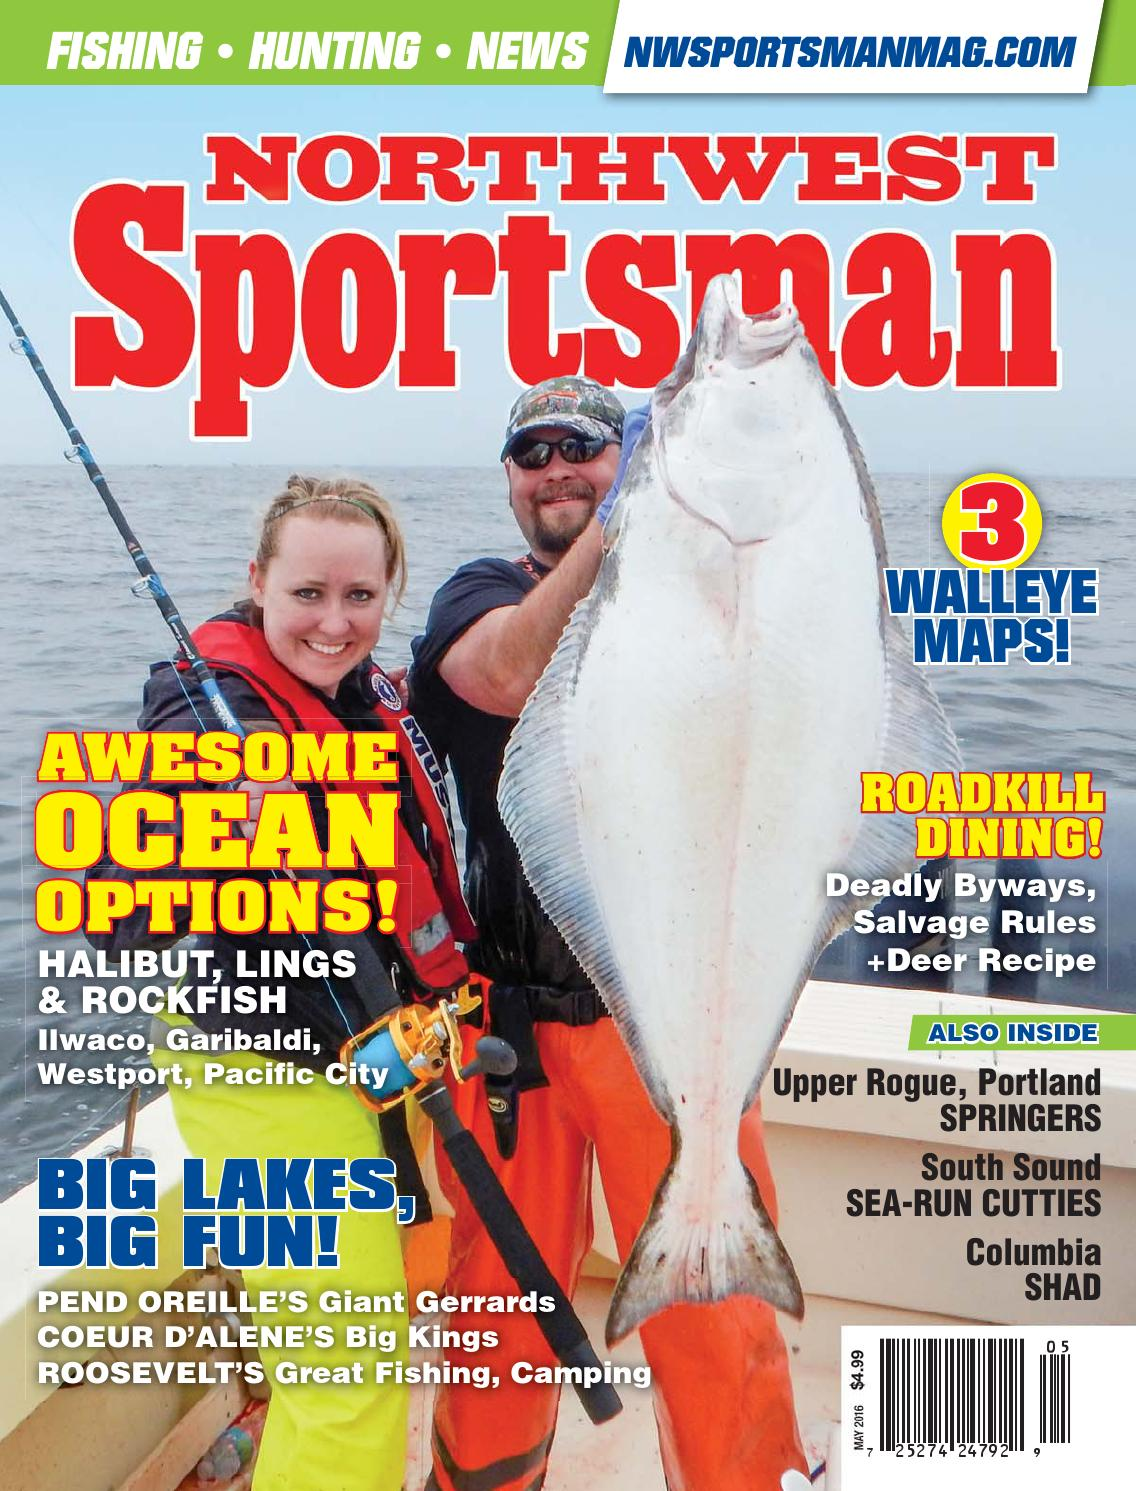 Custom Angler Bloody Minnow Kokanee Fishing Fly Salmon Steelhead Coho